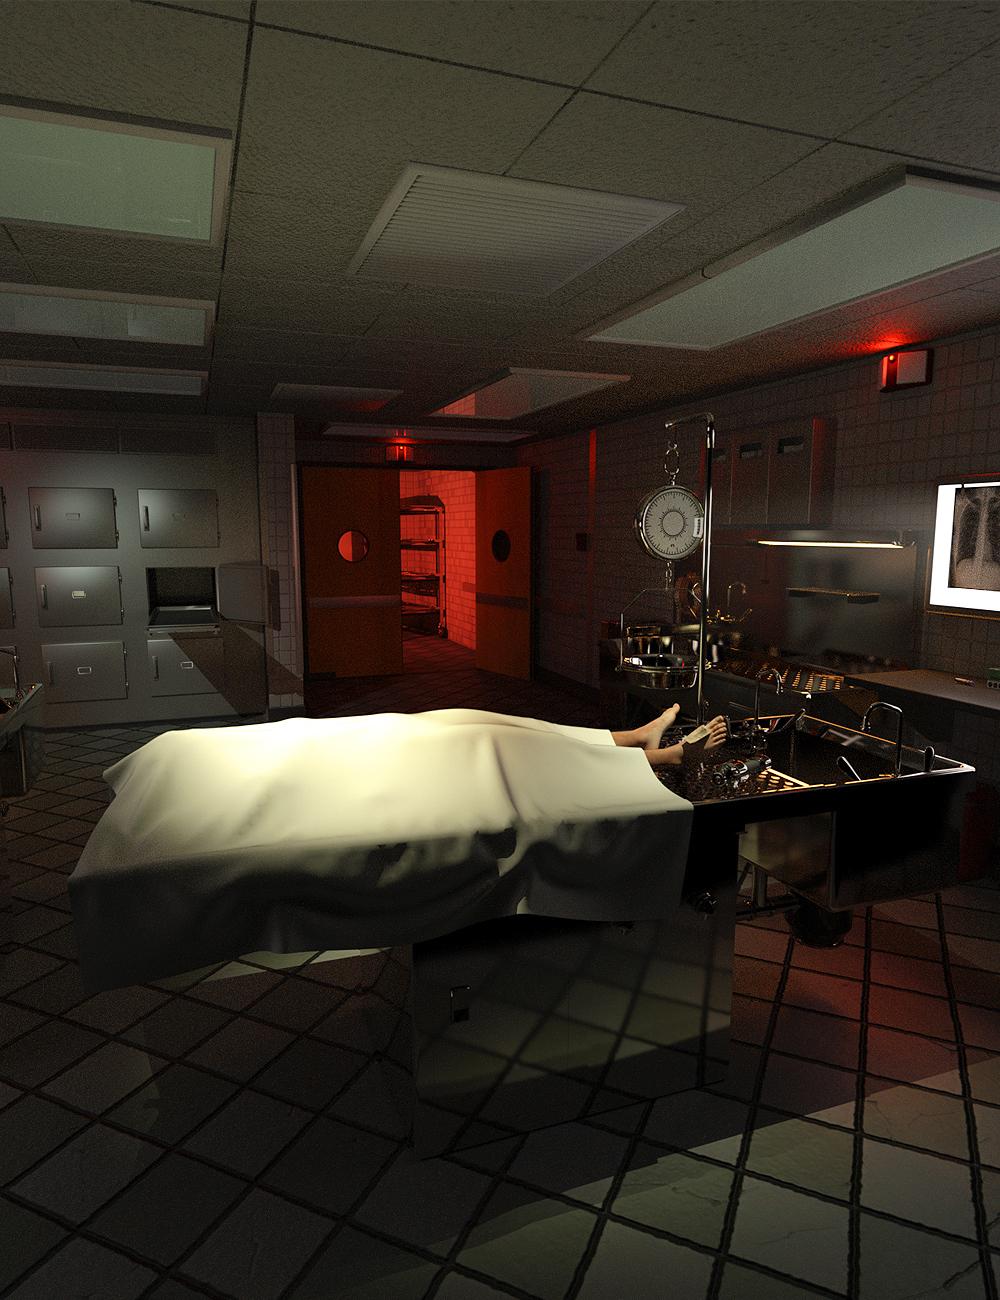 Autopsy by: The AntFarm, 3D Models by Daz 3D